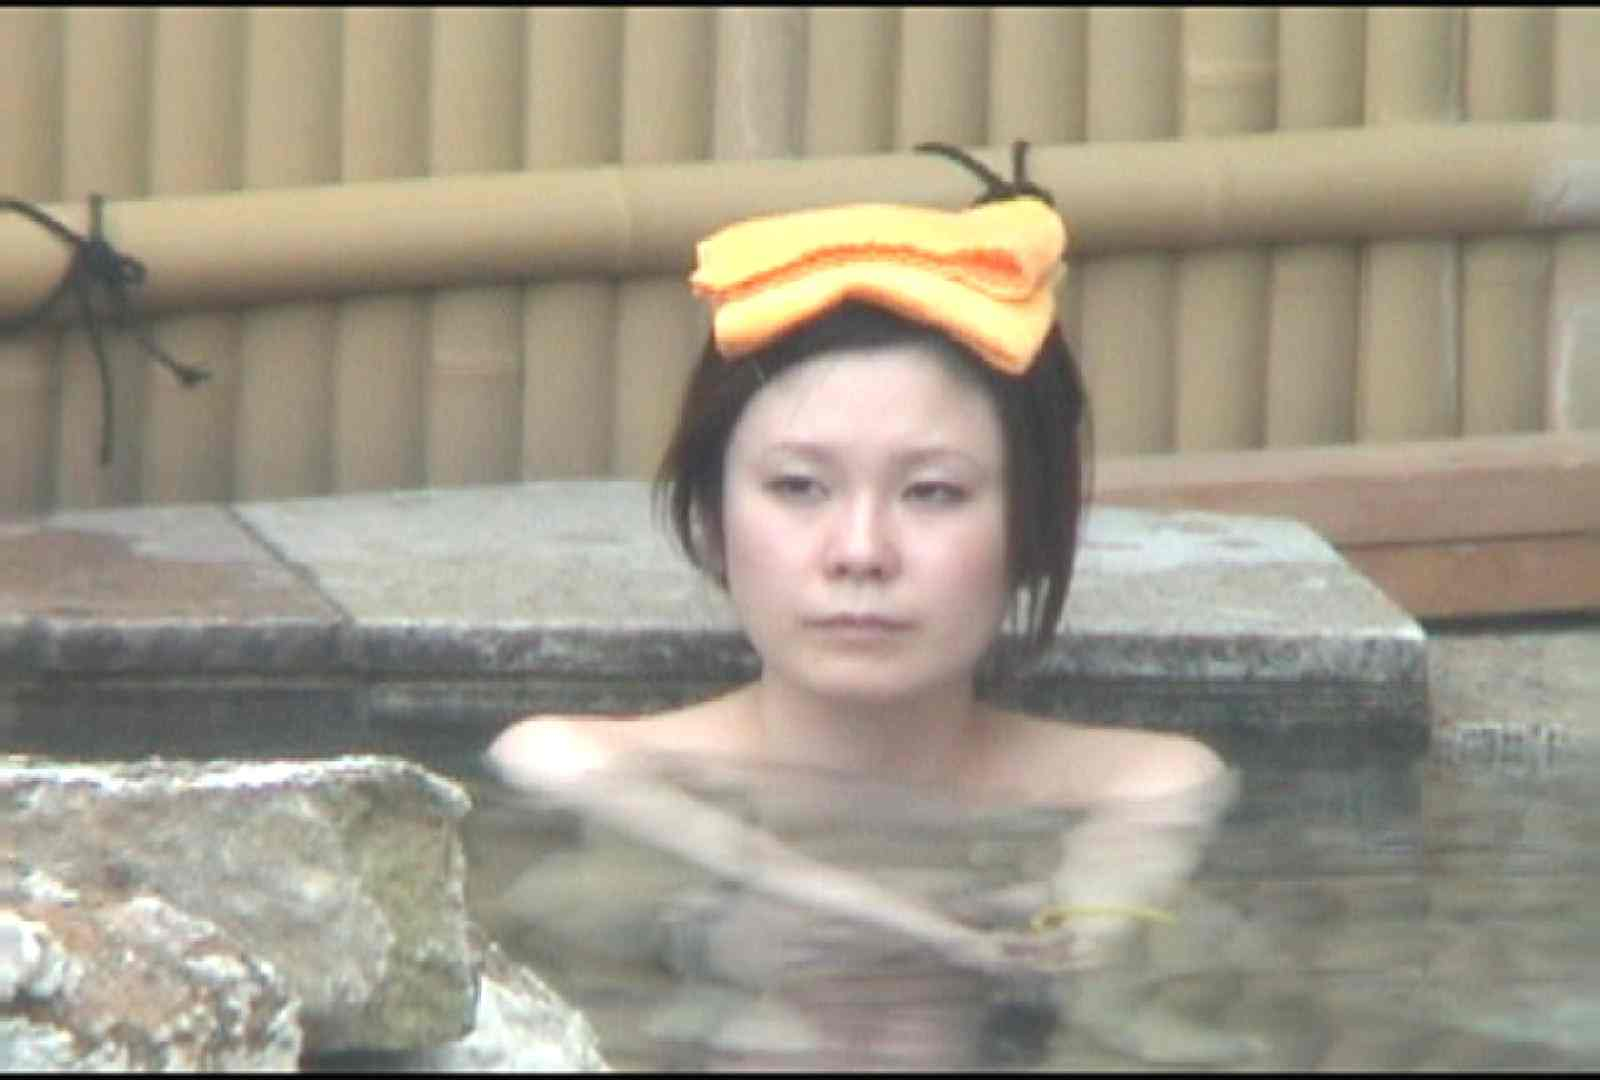 Aquaな露天風呂Vol.177 盗撮師作品  102pic 45